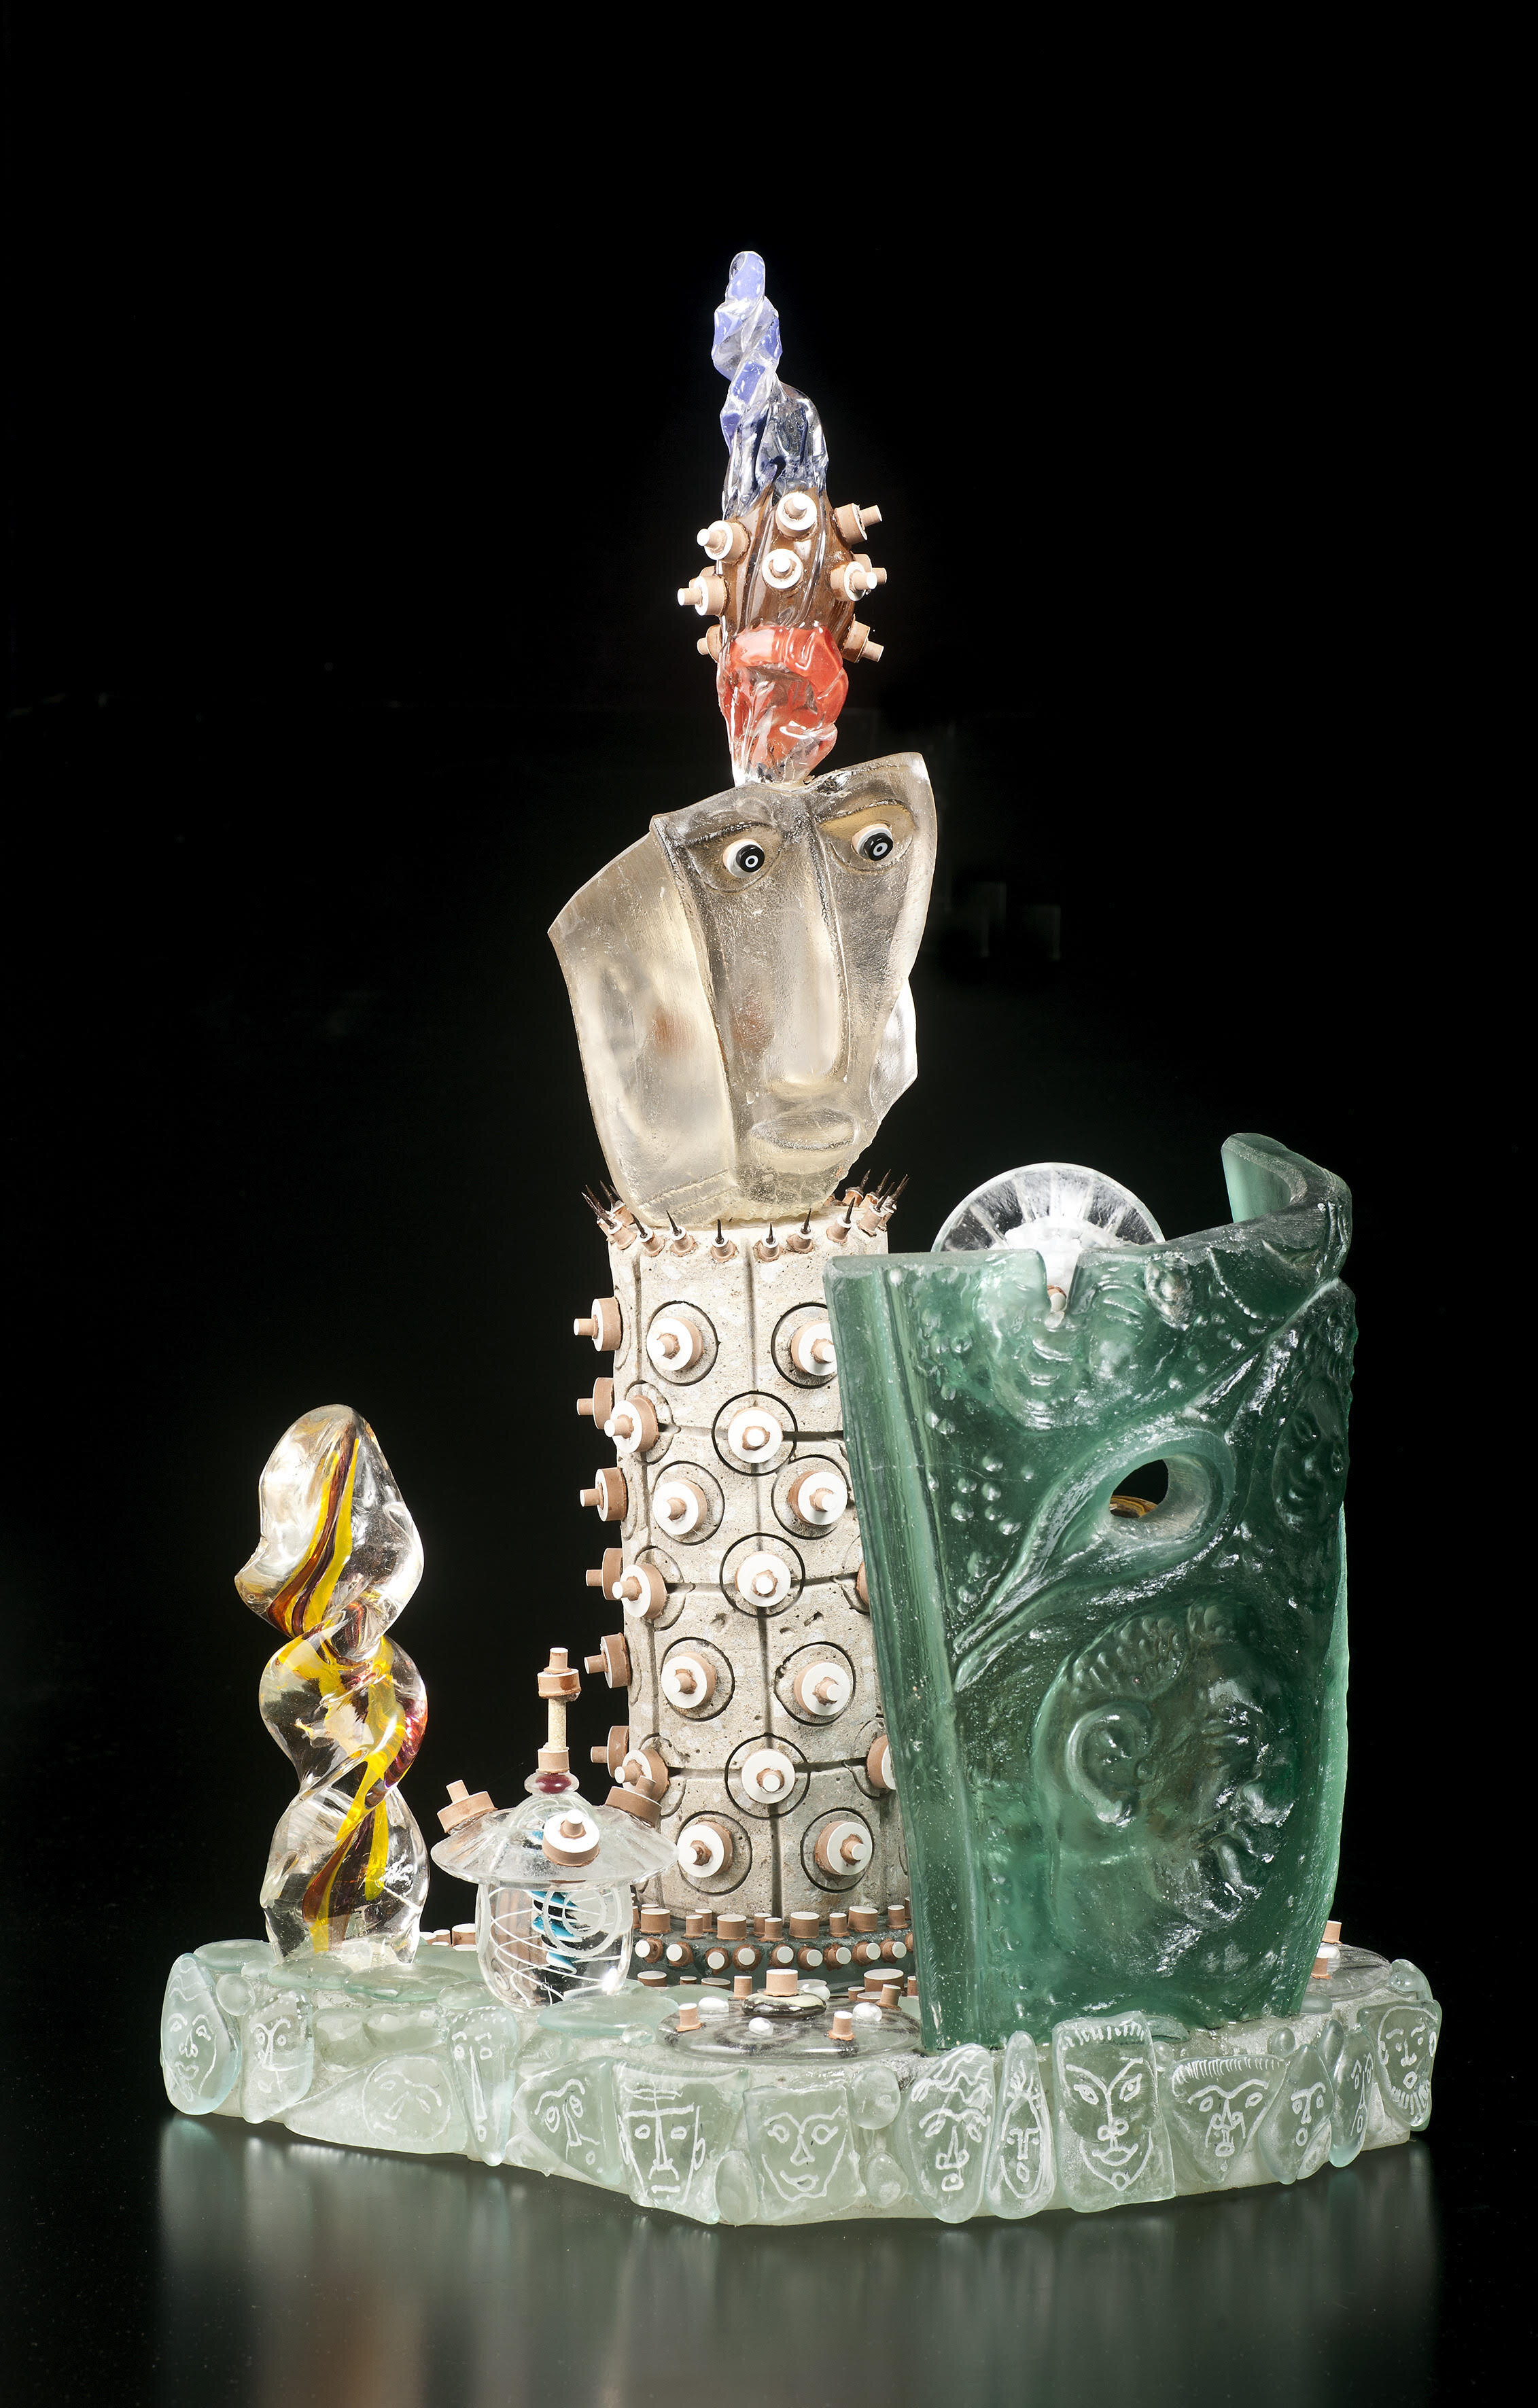 Stephen Skillitzi,  'Personal Space Invasion'.  glass, concrete, clay, metal